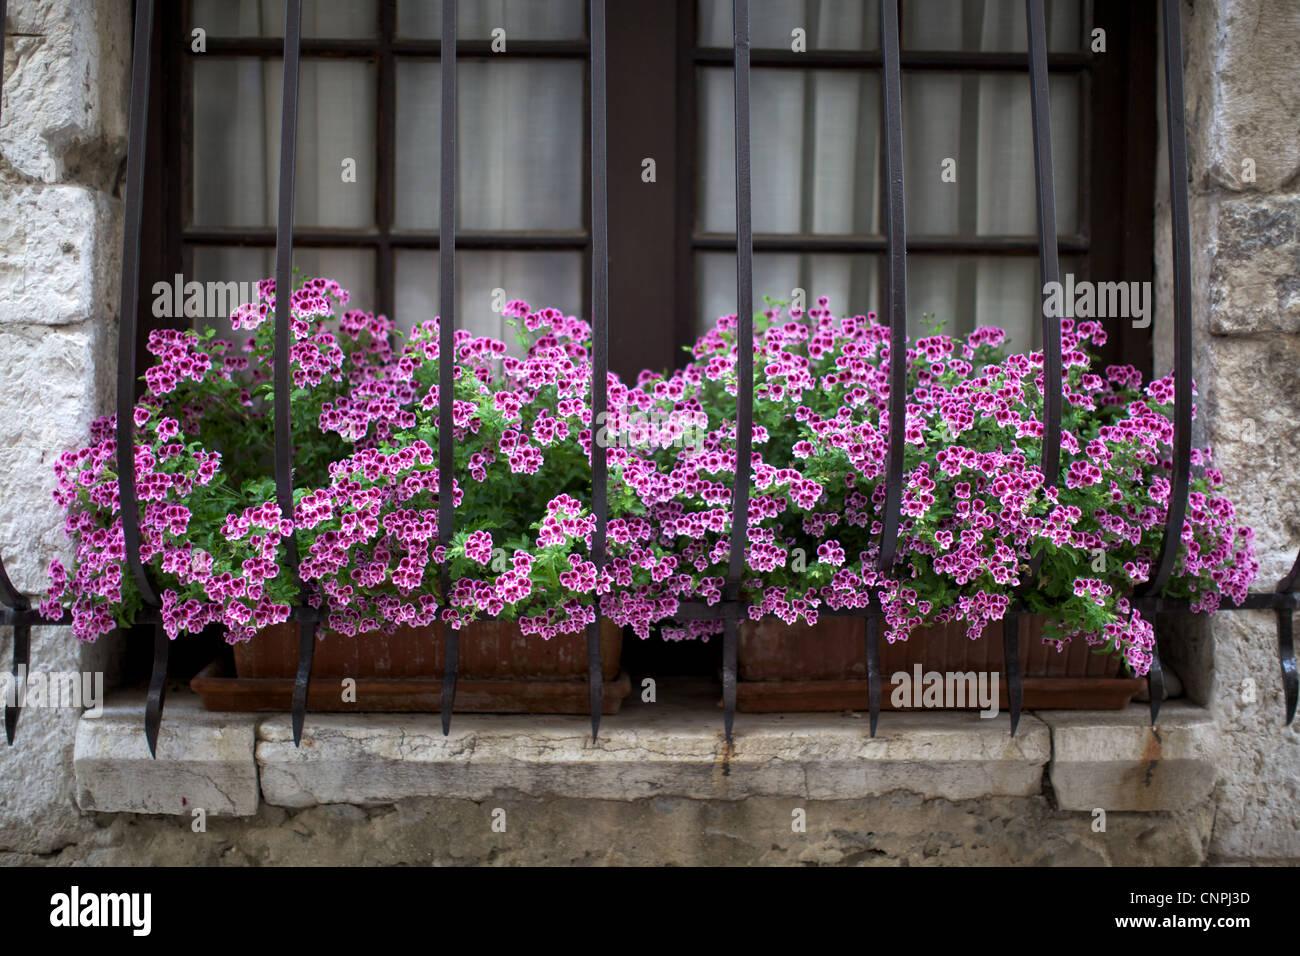 flower [flower box] [close up] windowsill villa - Stock Image